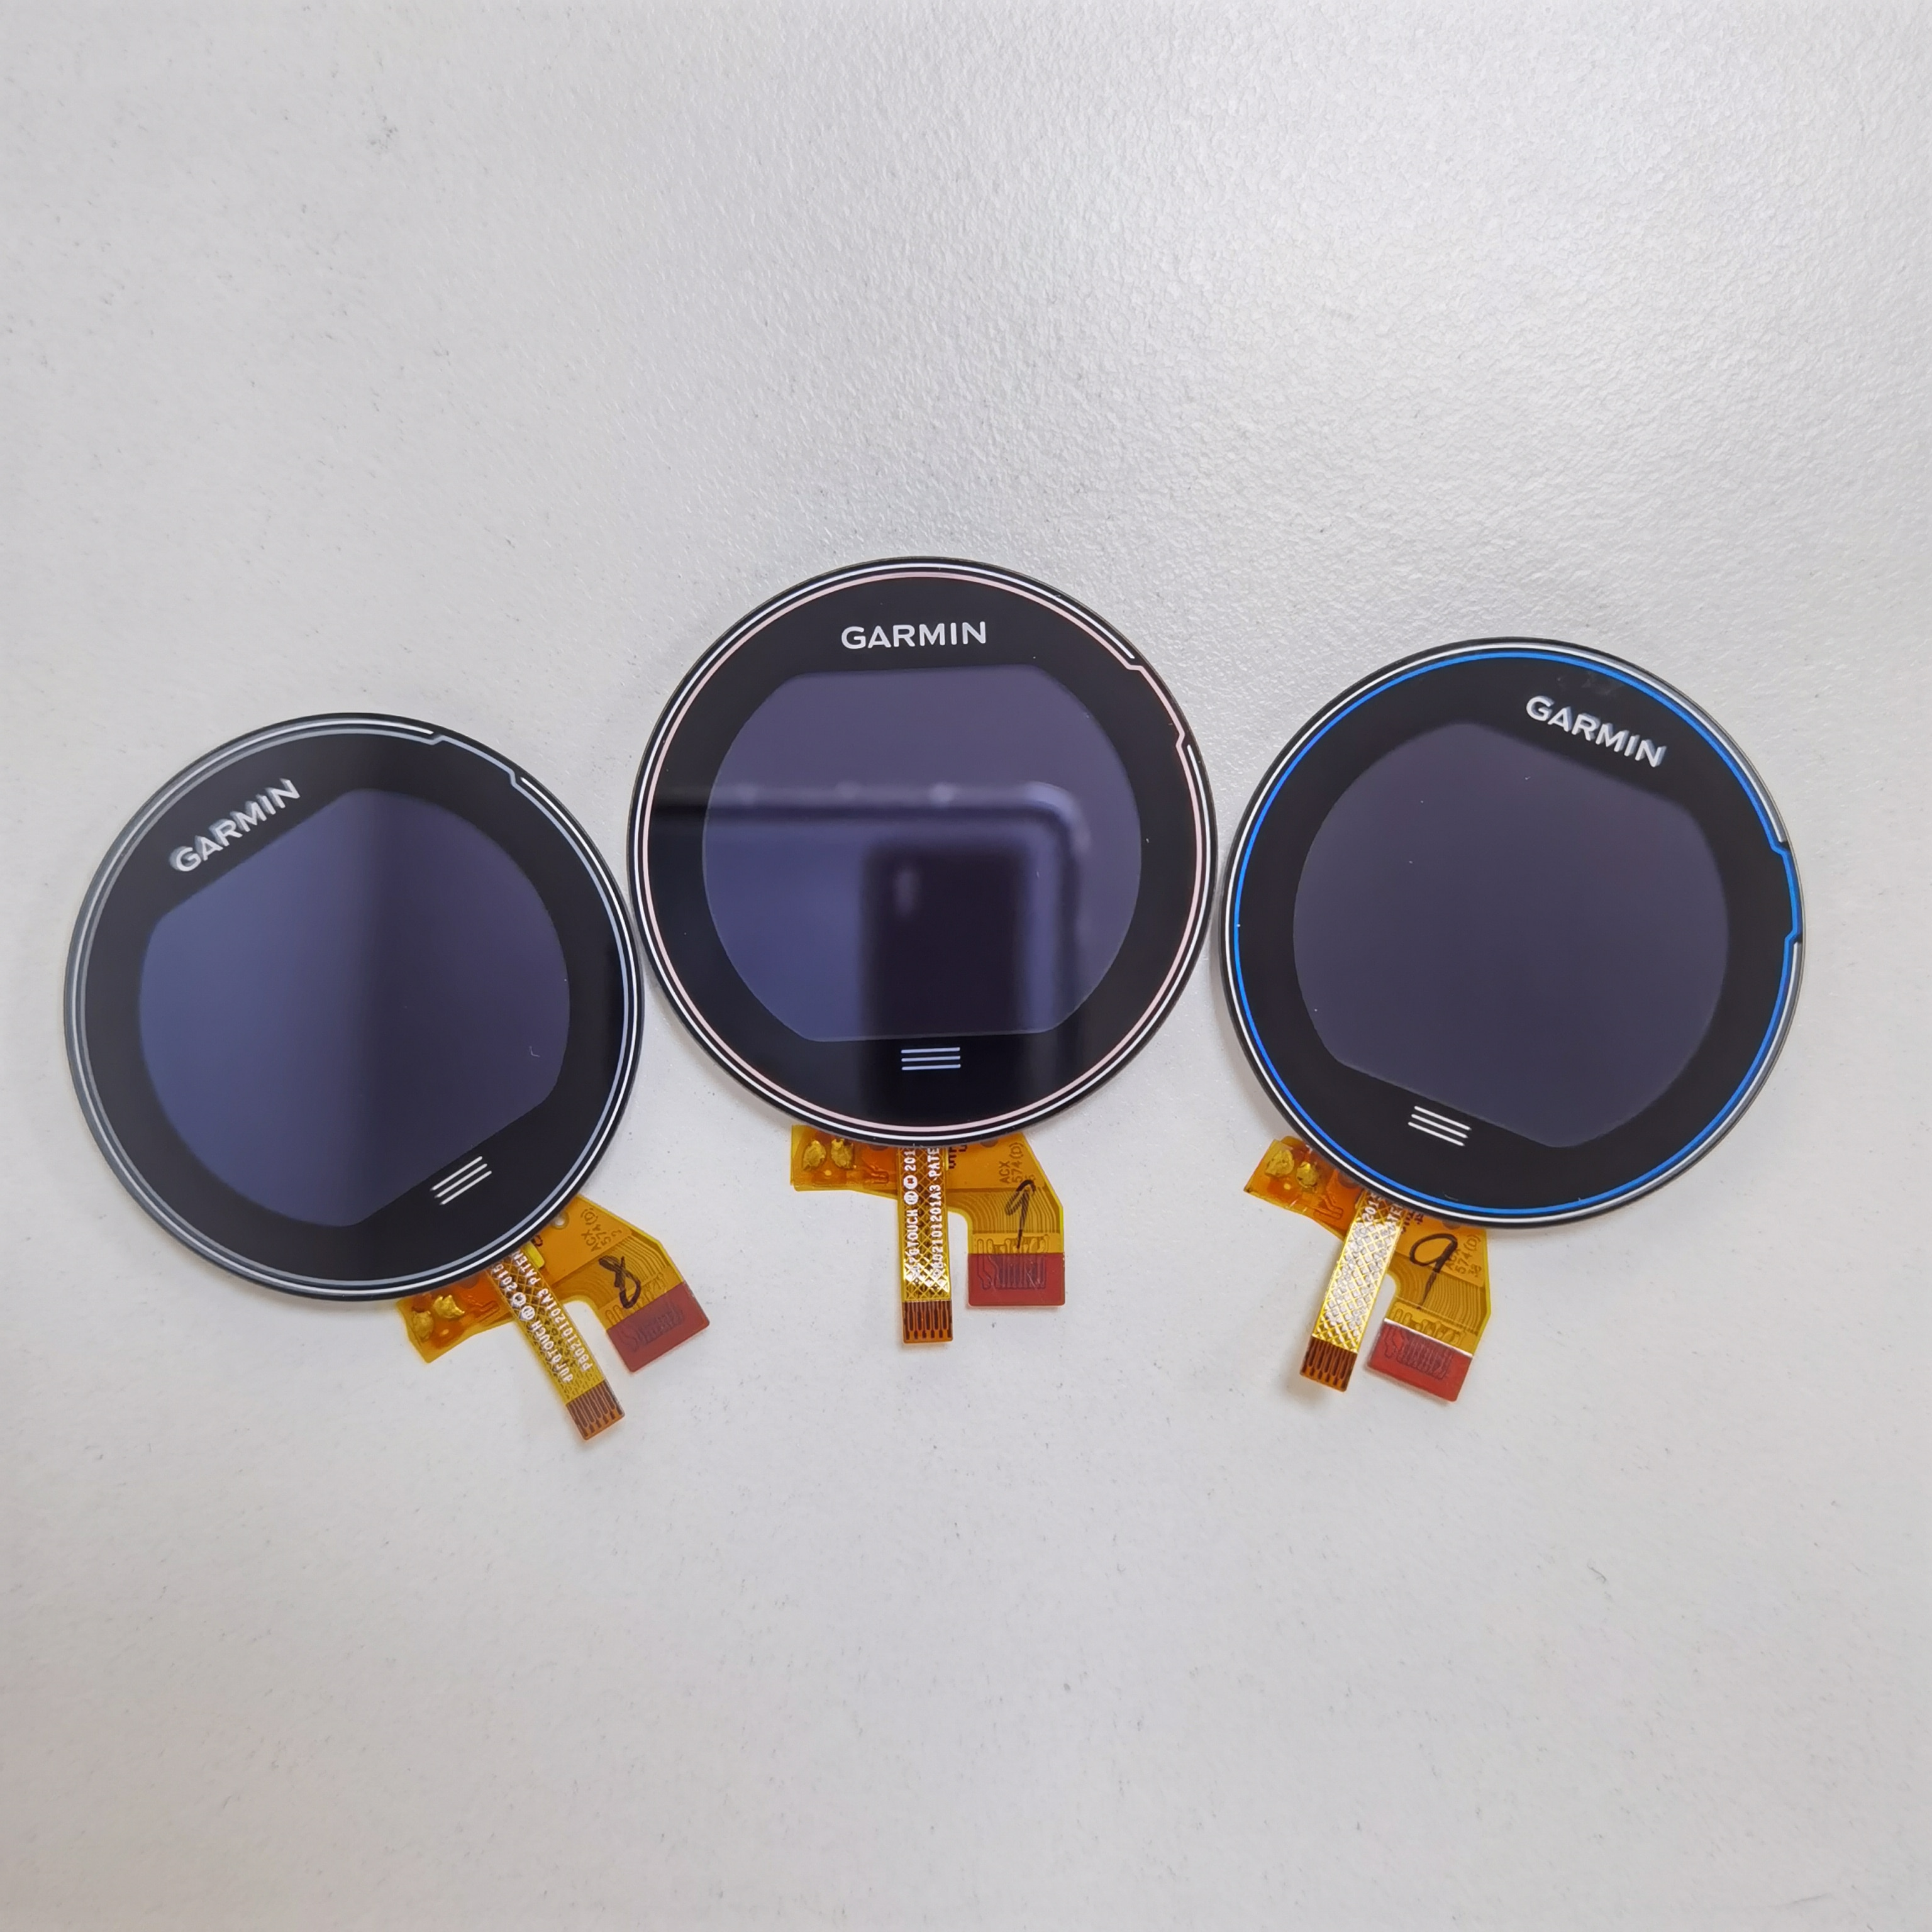 Forerunner 630 شاشة الكريستال السائل للغارمين Forerunner 630 LCD قطع غيار للشاشة إصلاح